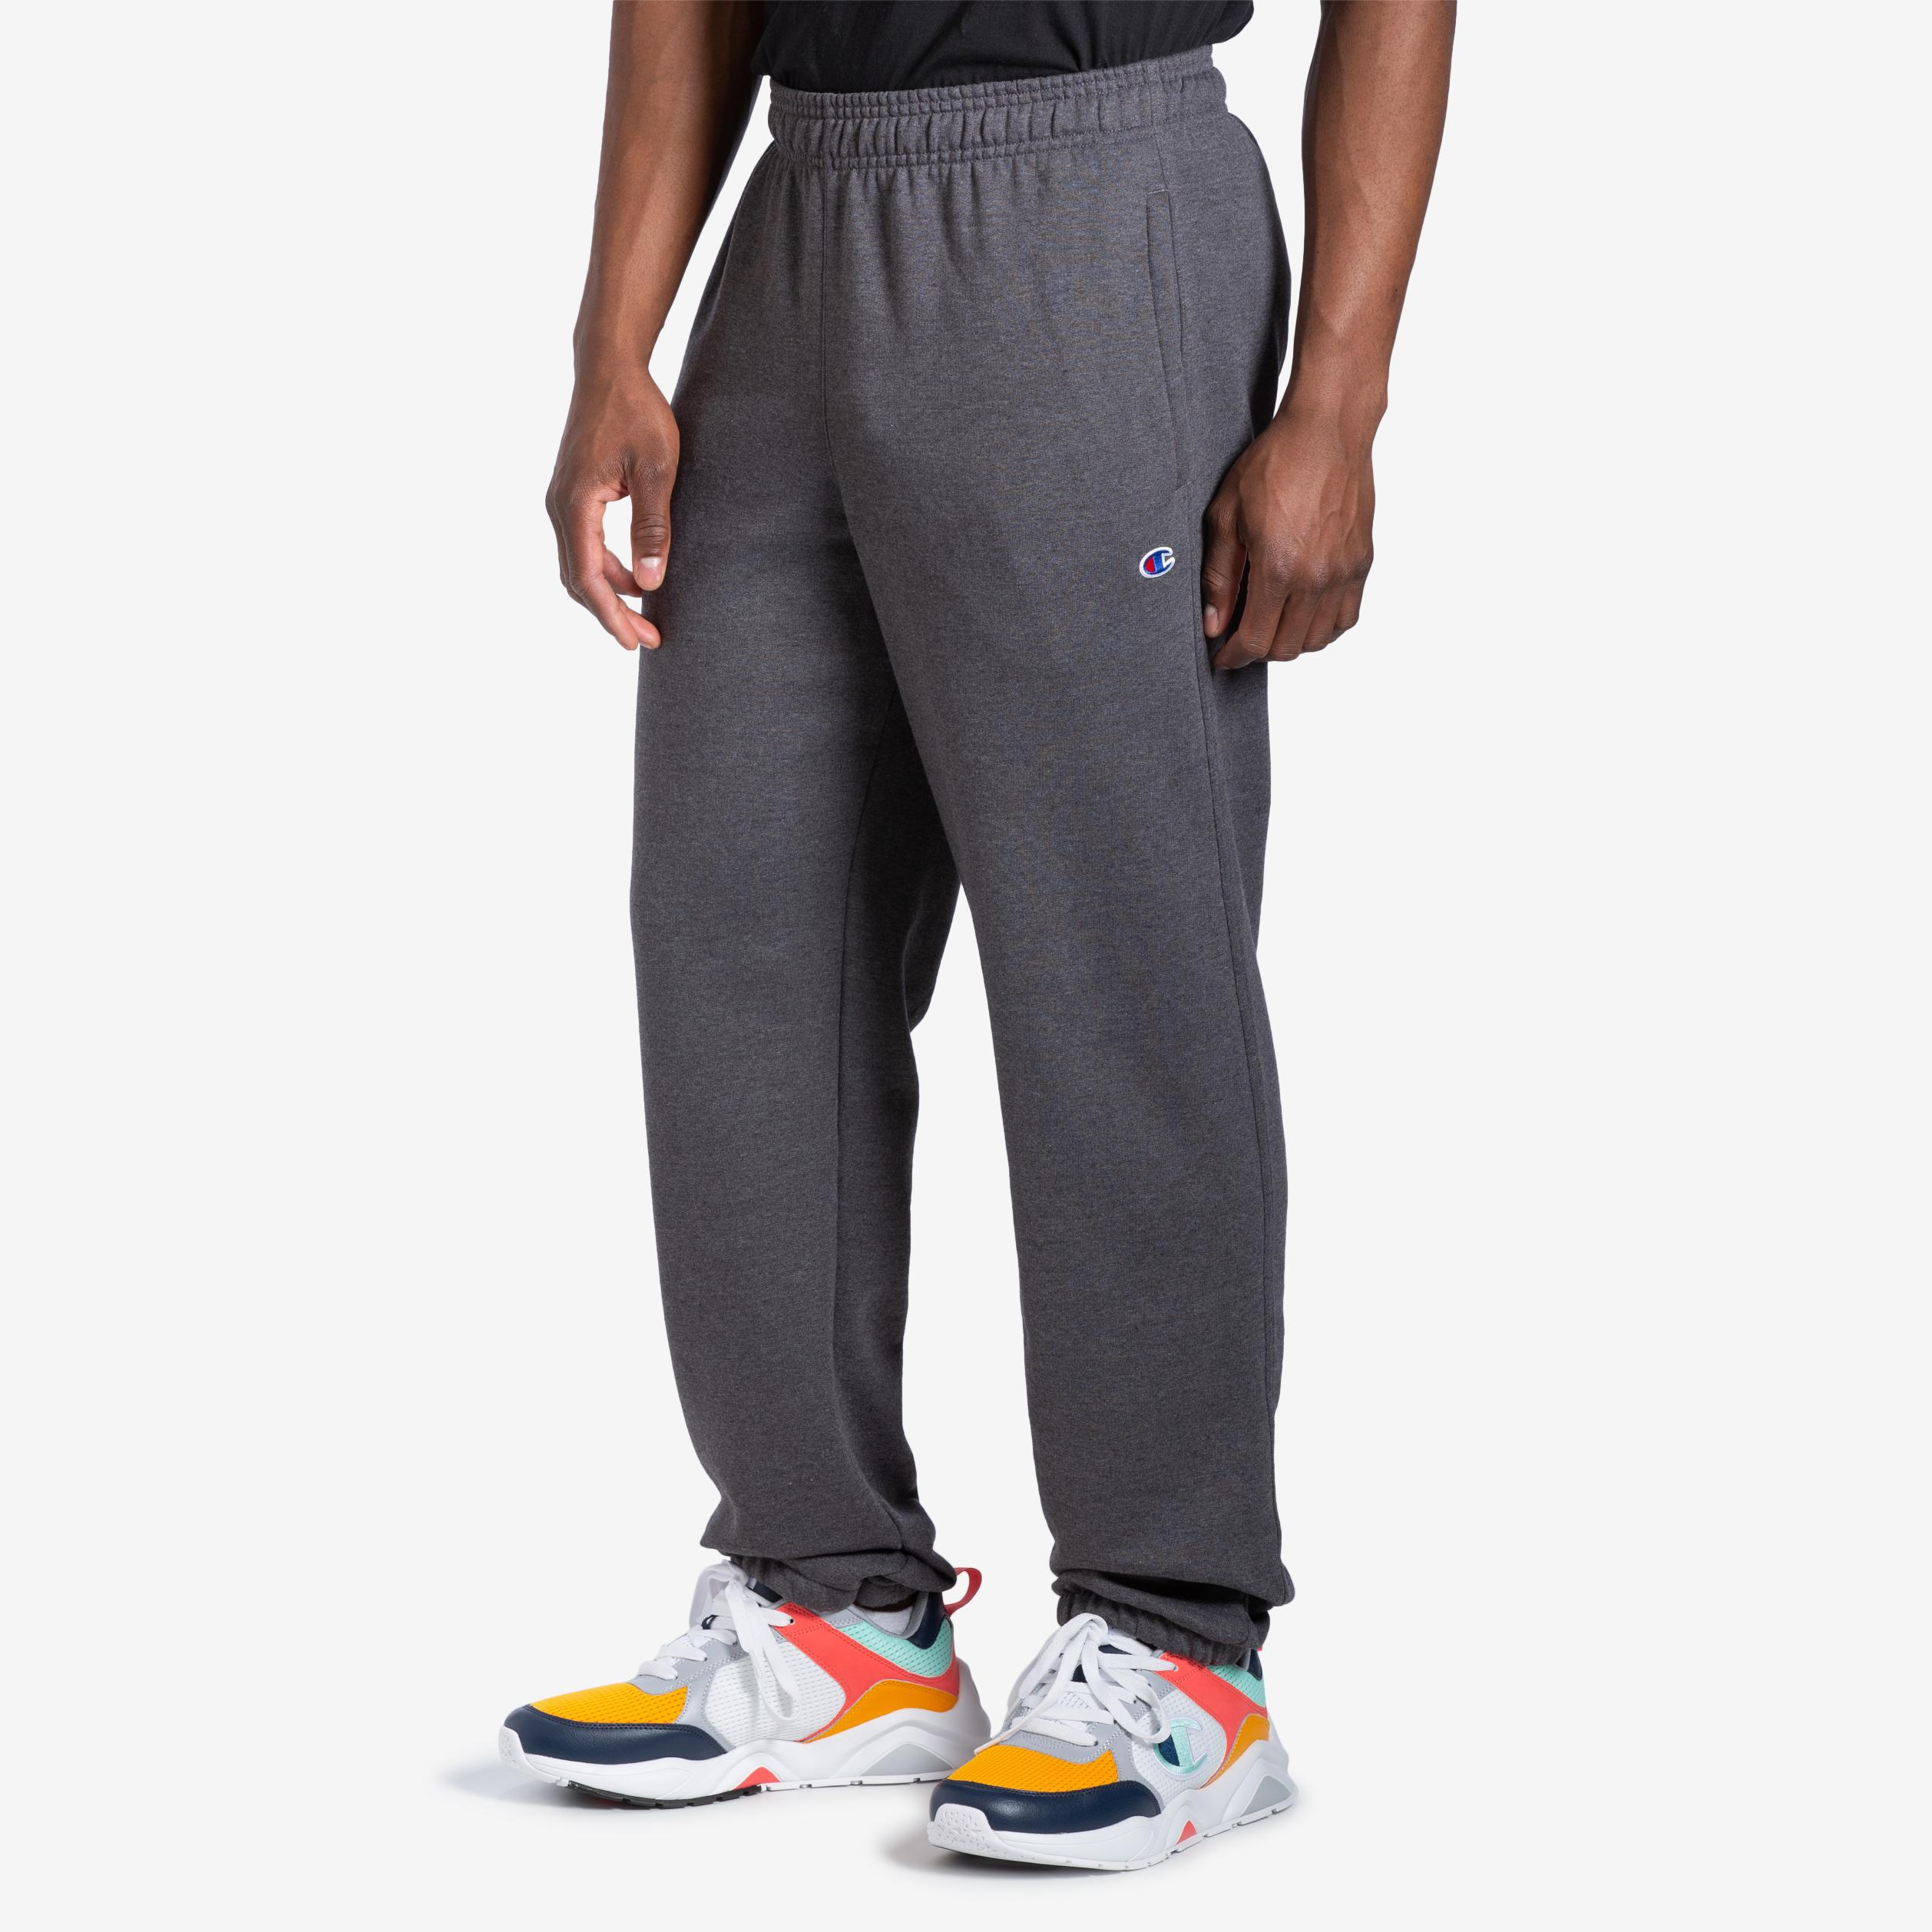 Men's Powerblend Sweats Relaxed Bottom Pants